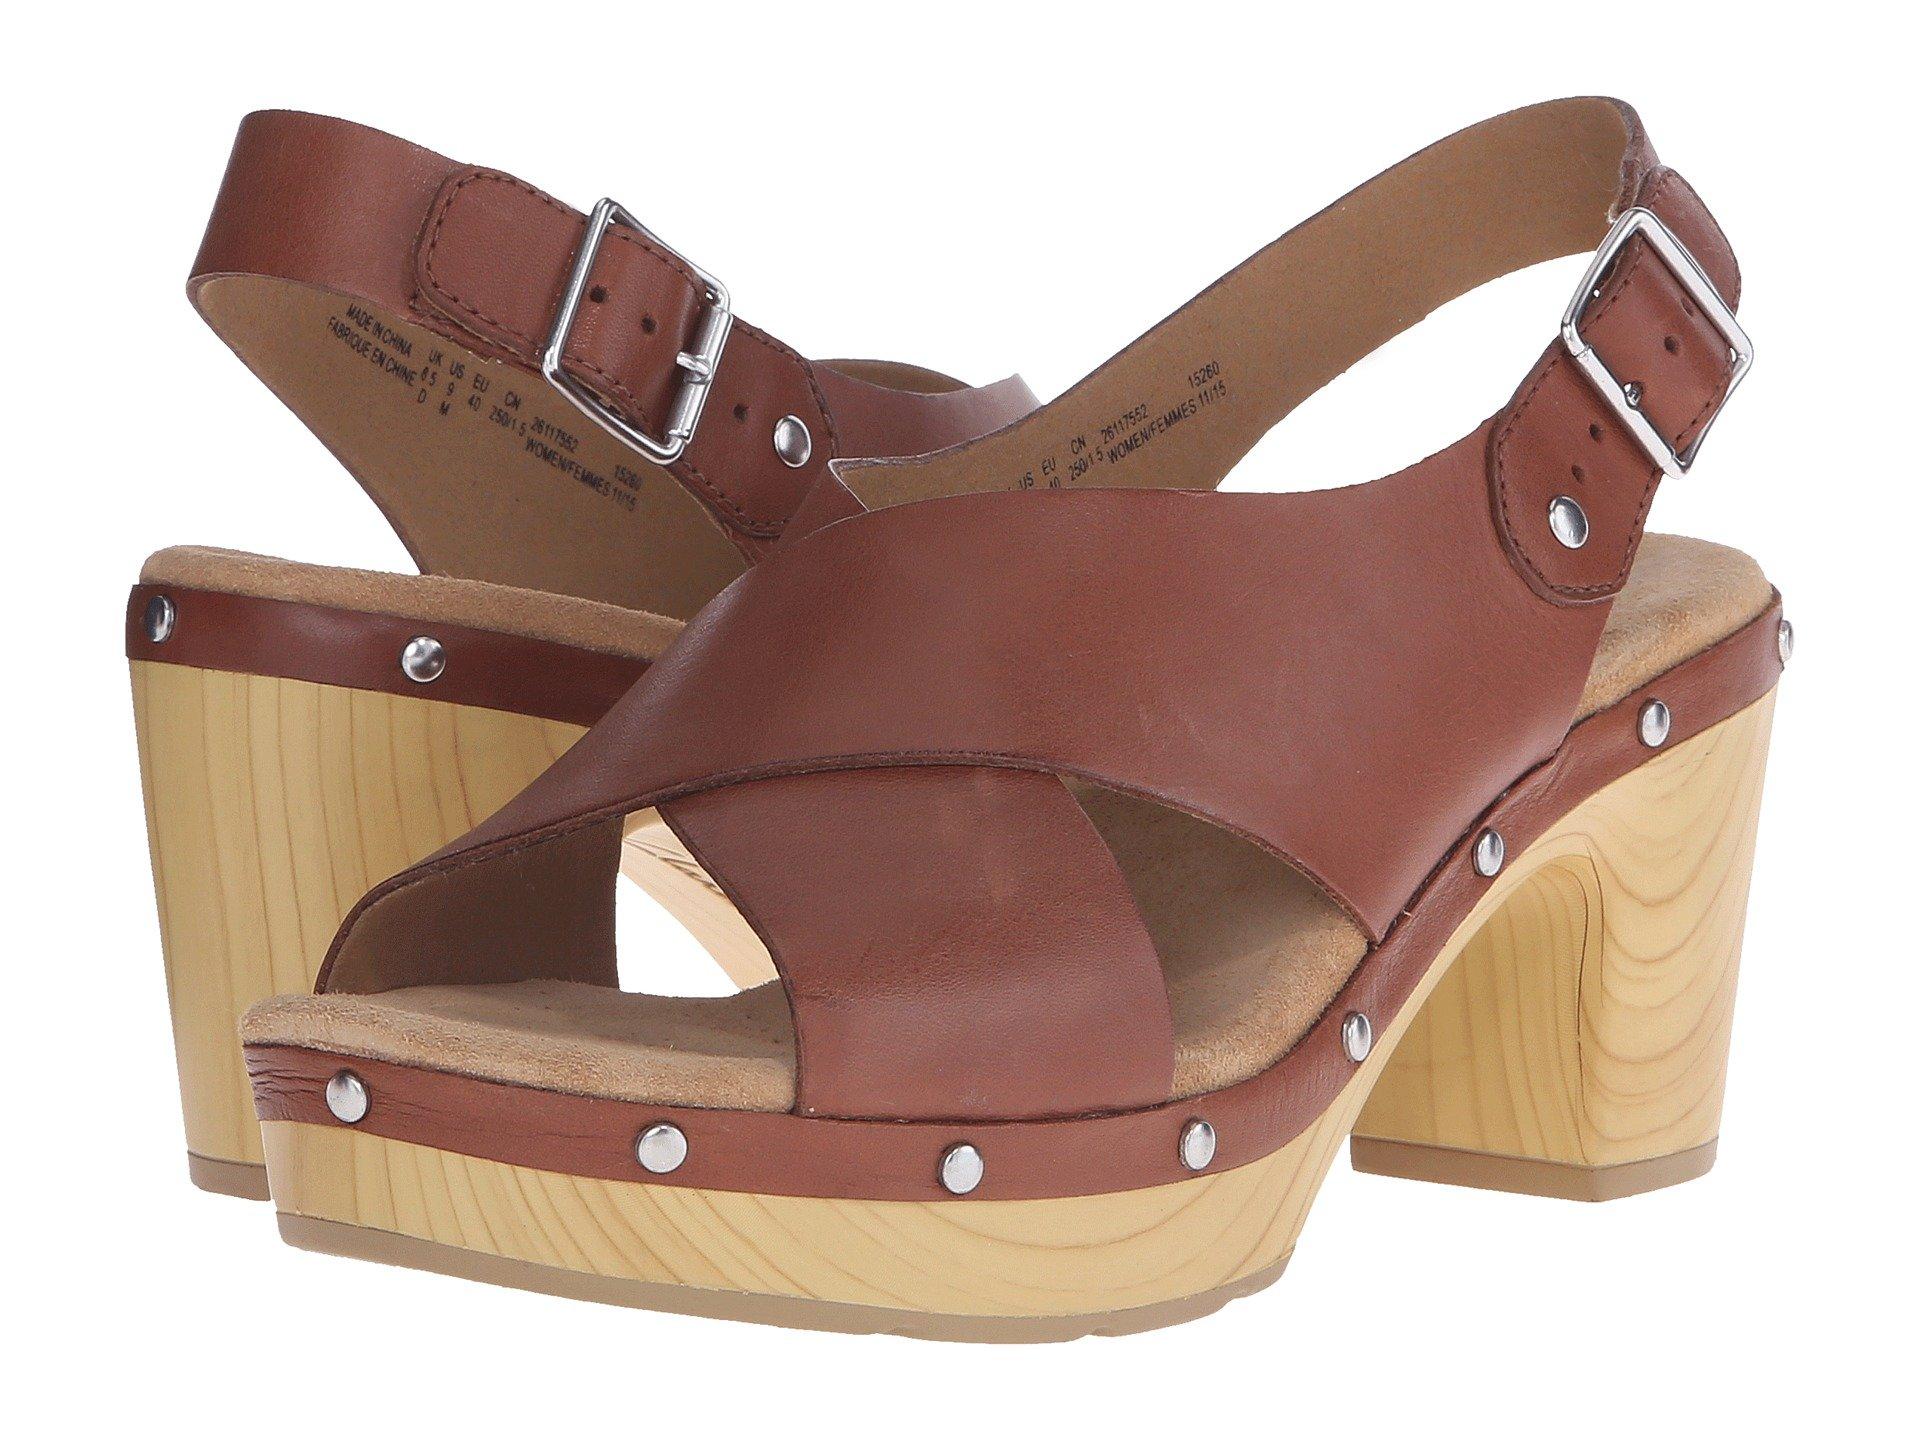 CLARKS Ledella Club, Nutmeg Leather